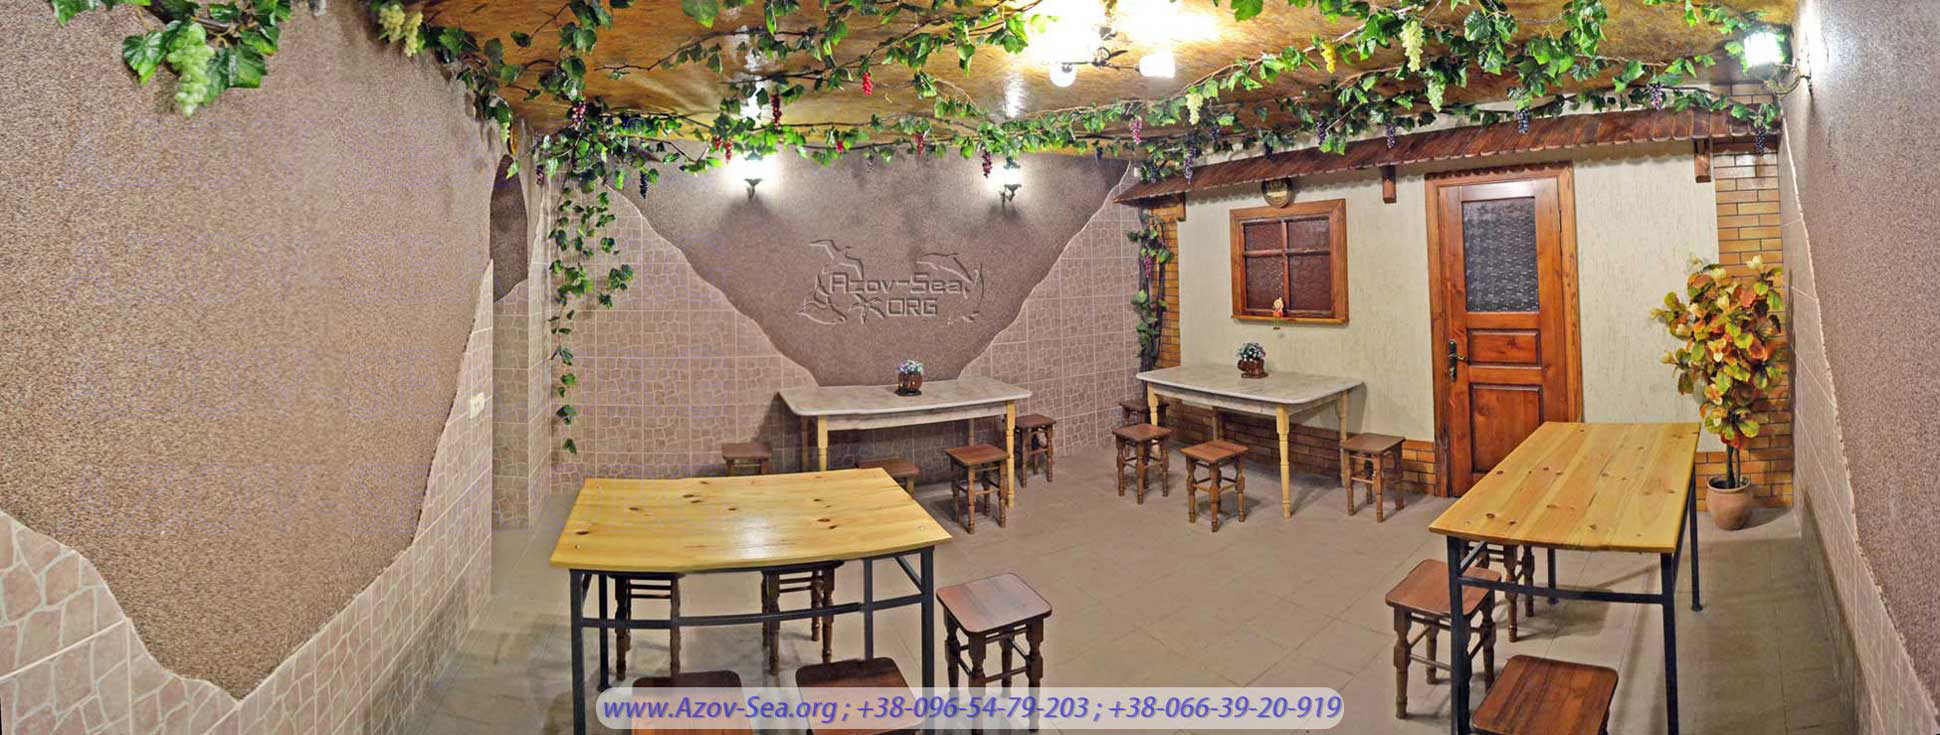 Пансионат Тимур, Новое кафе на побережье Азовского моря